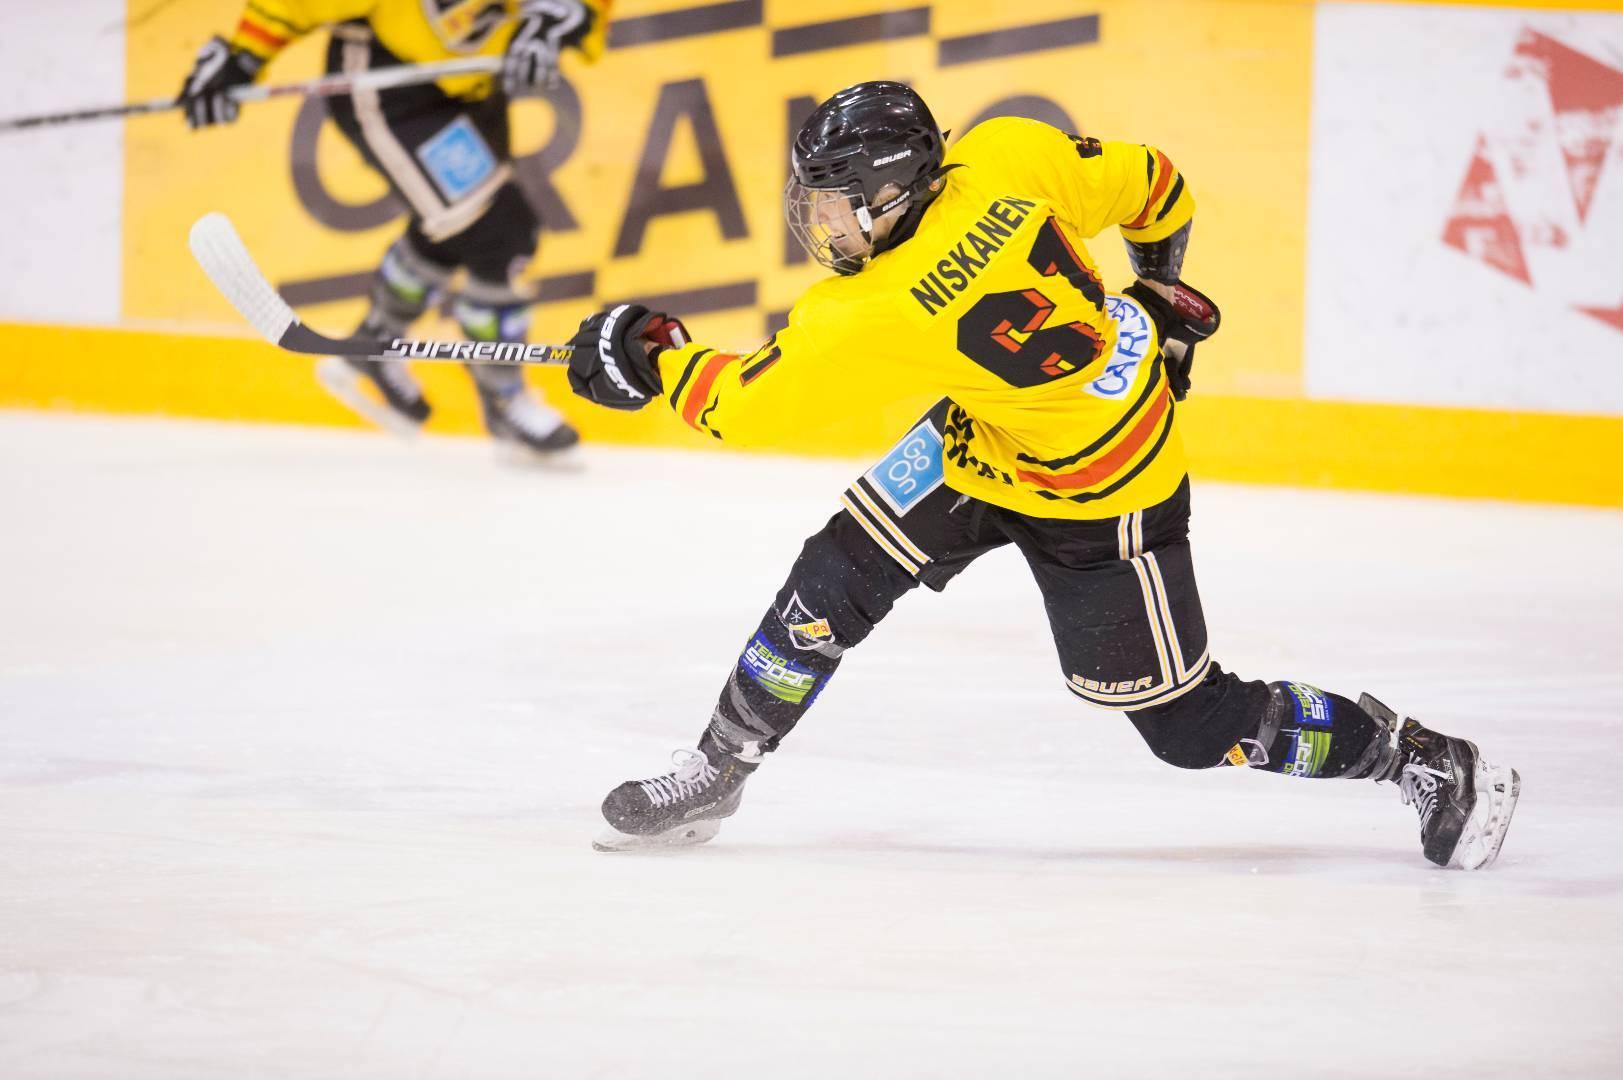 Liiga: Q&A With Tanja Niskanen